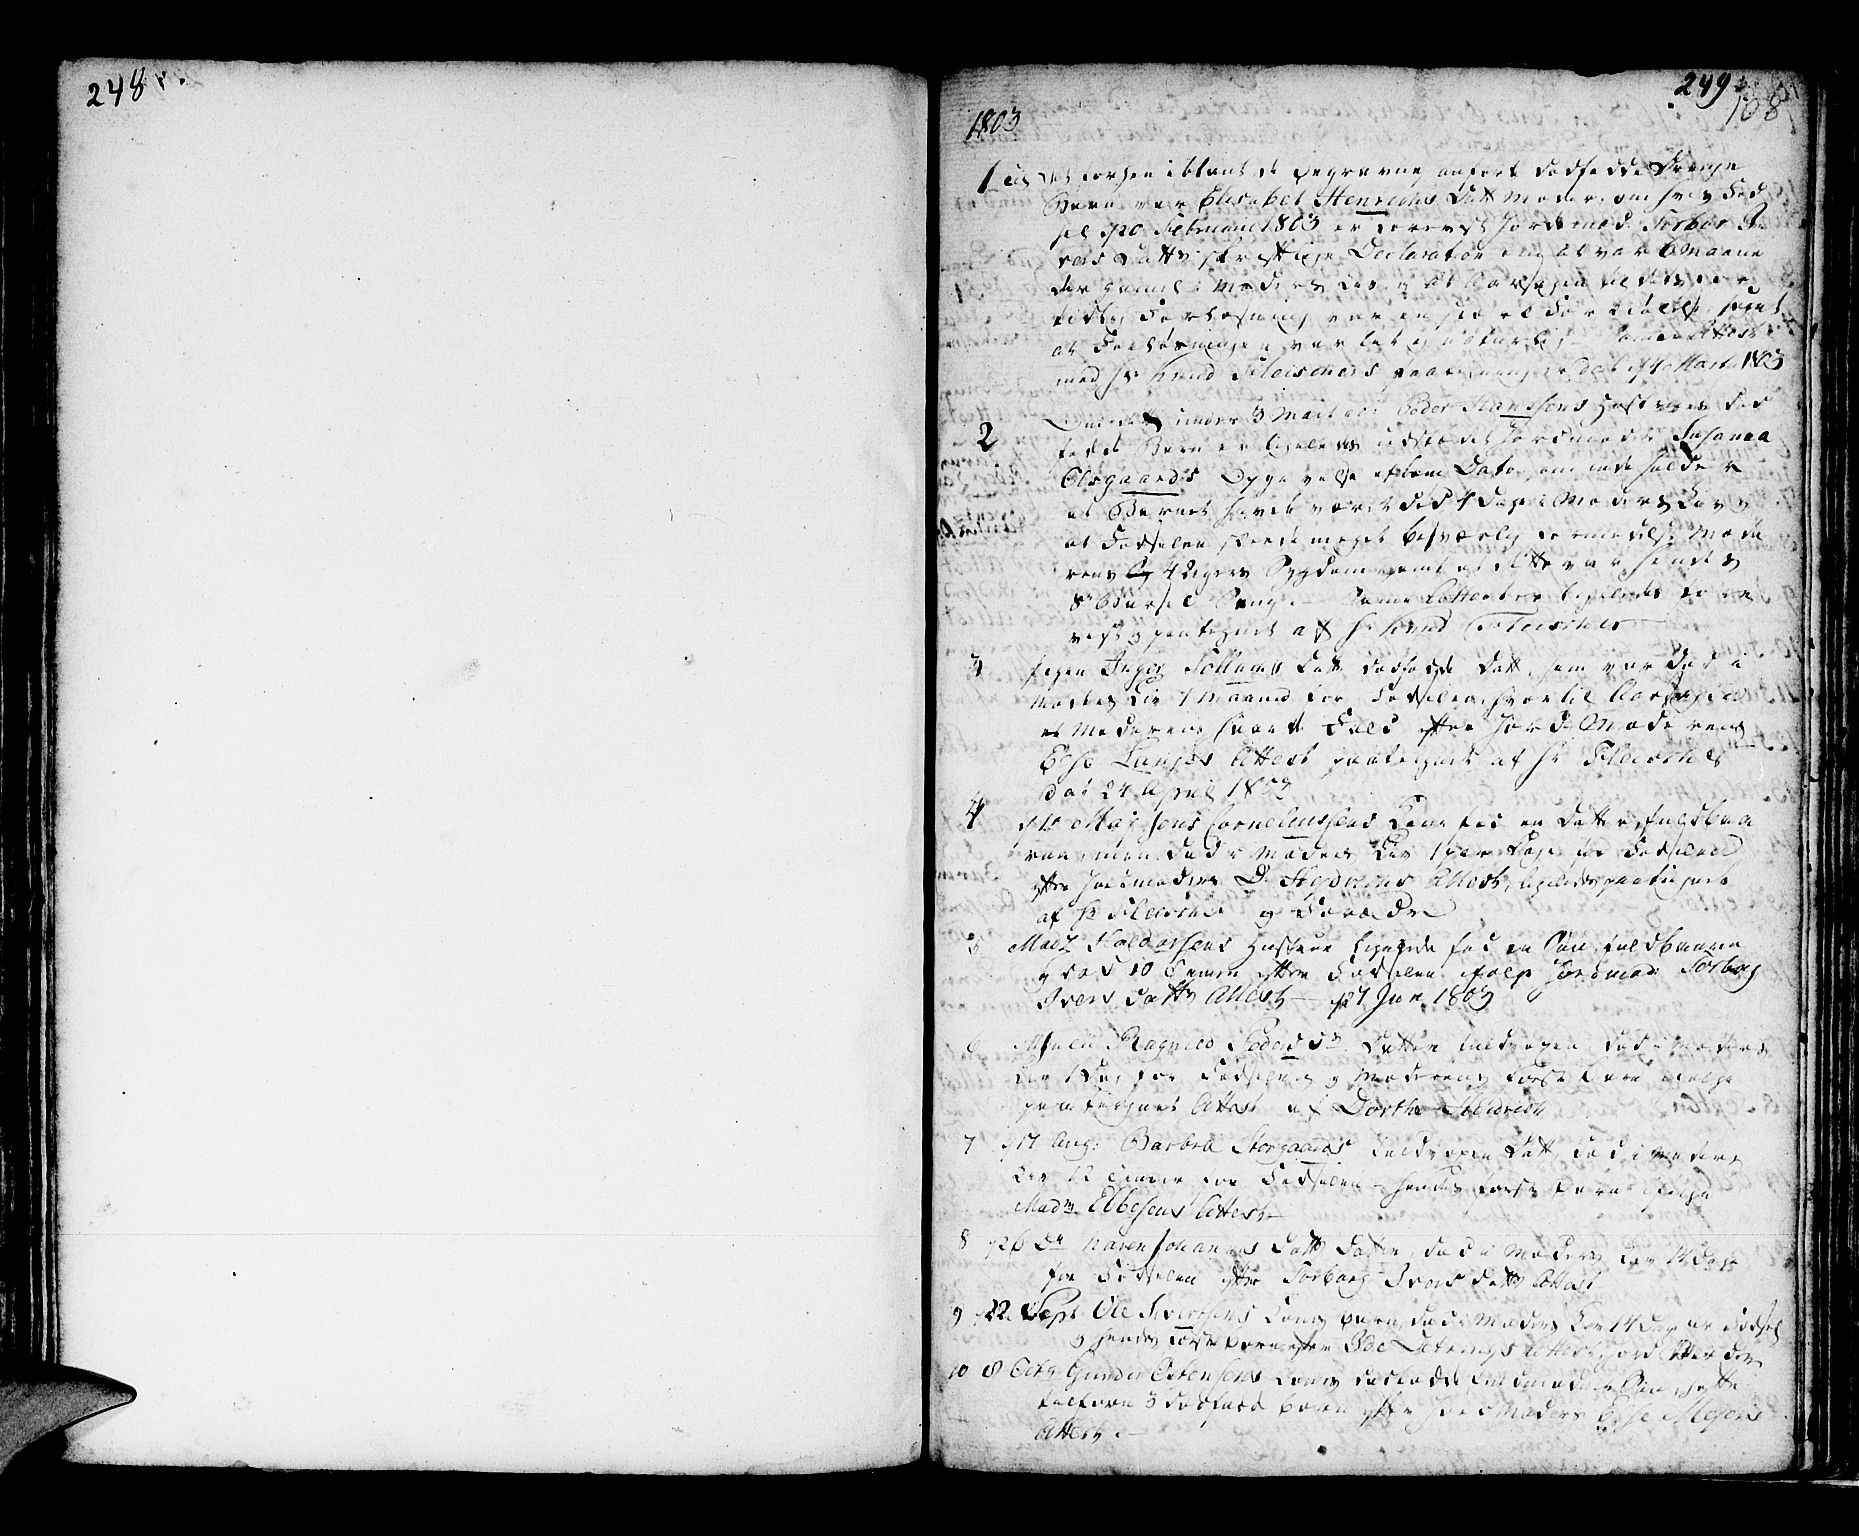 SAB, Domkirken Sokneprestembete, H/Haa/L0009: Parish register (official) no. A 9, 1776-1821, p. 248-249